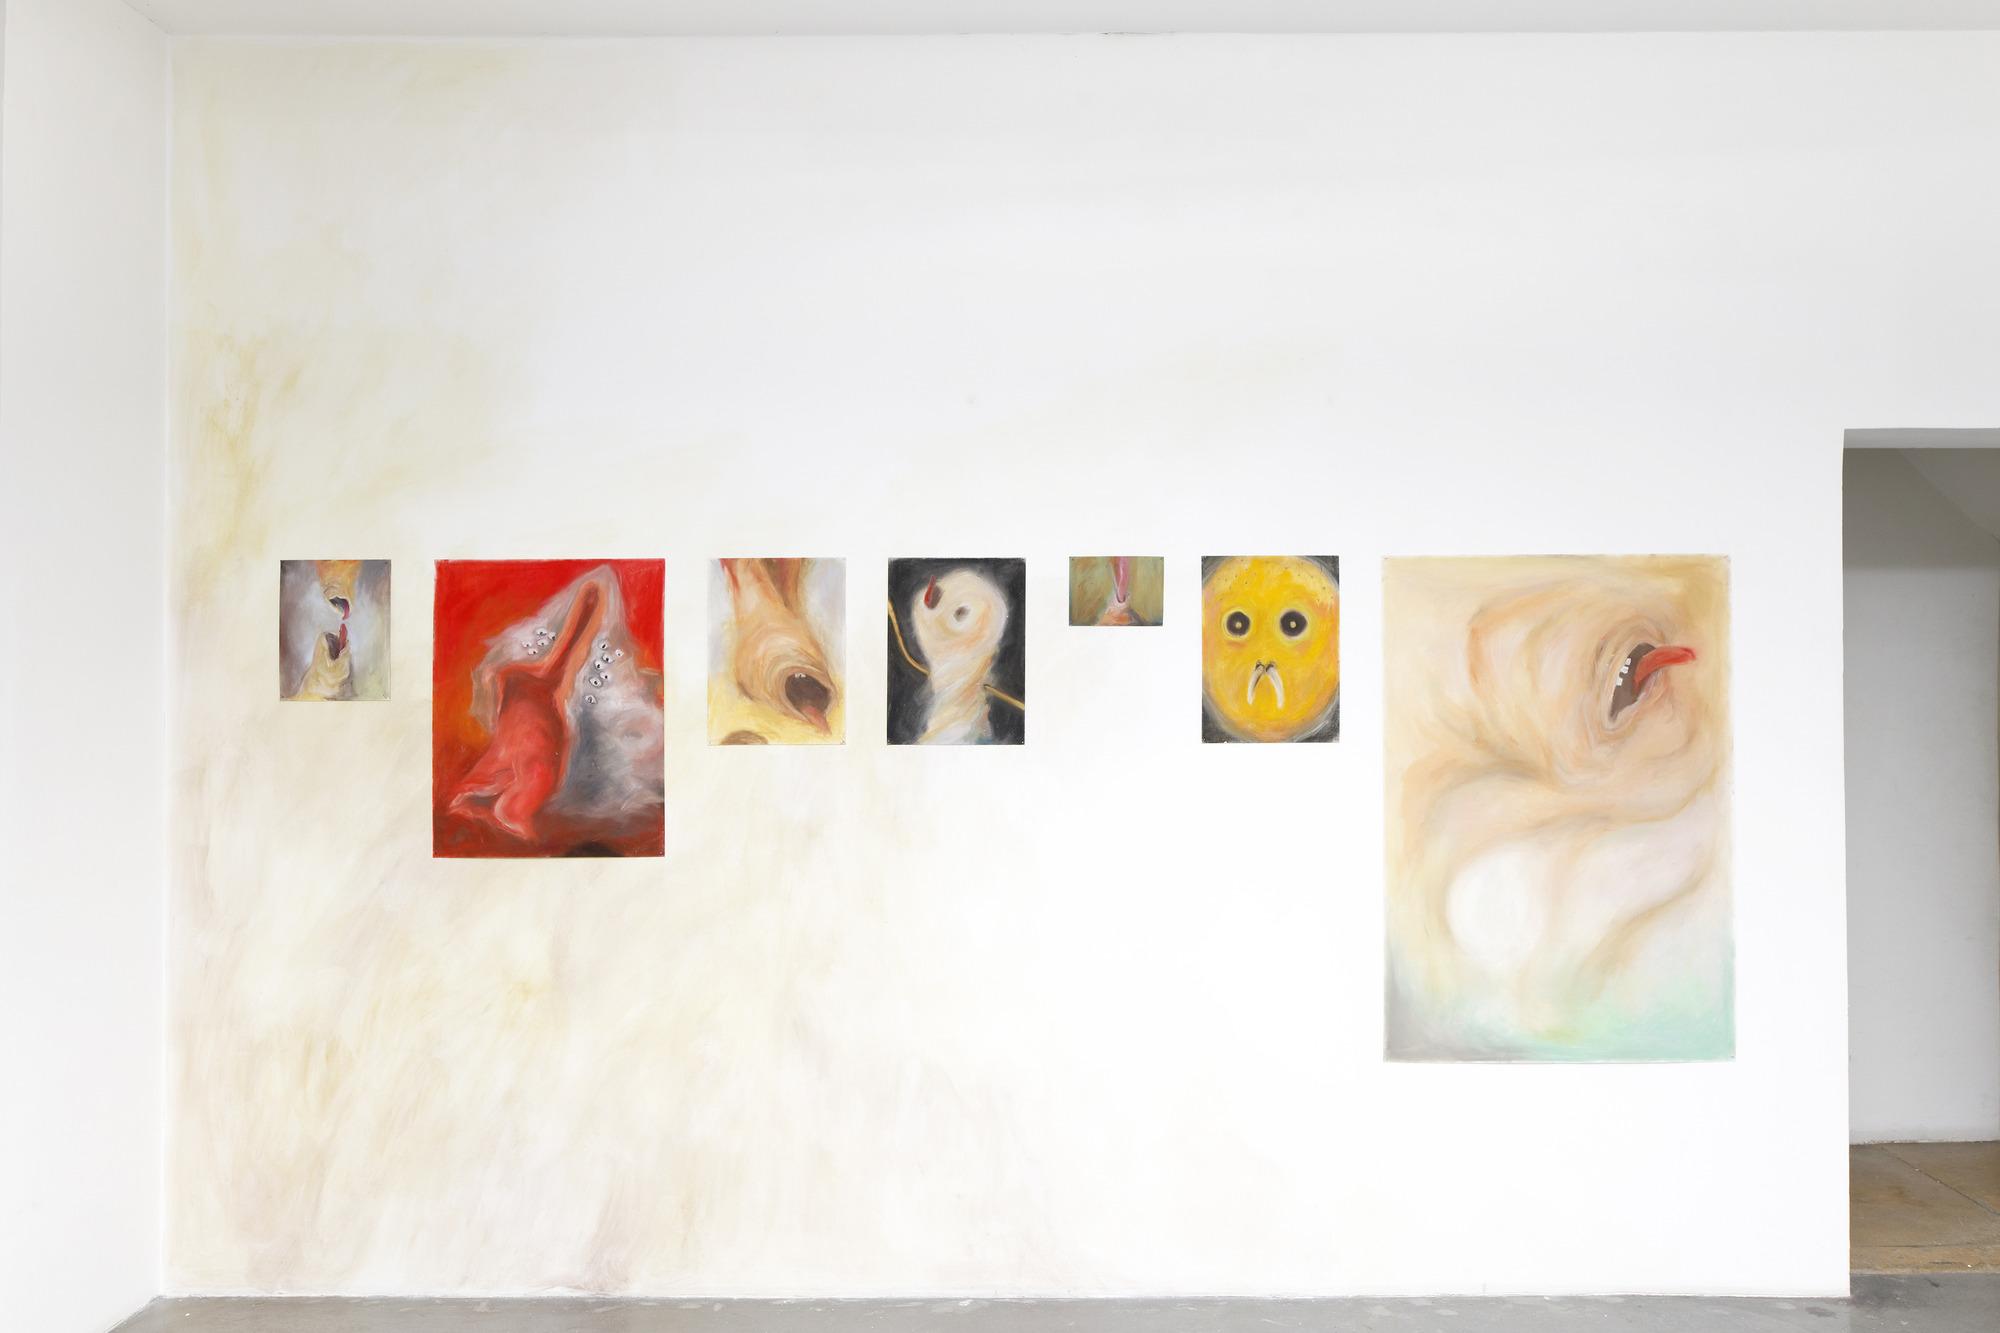 Bad Juju At New Galerie Art Viewer